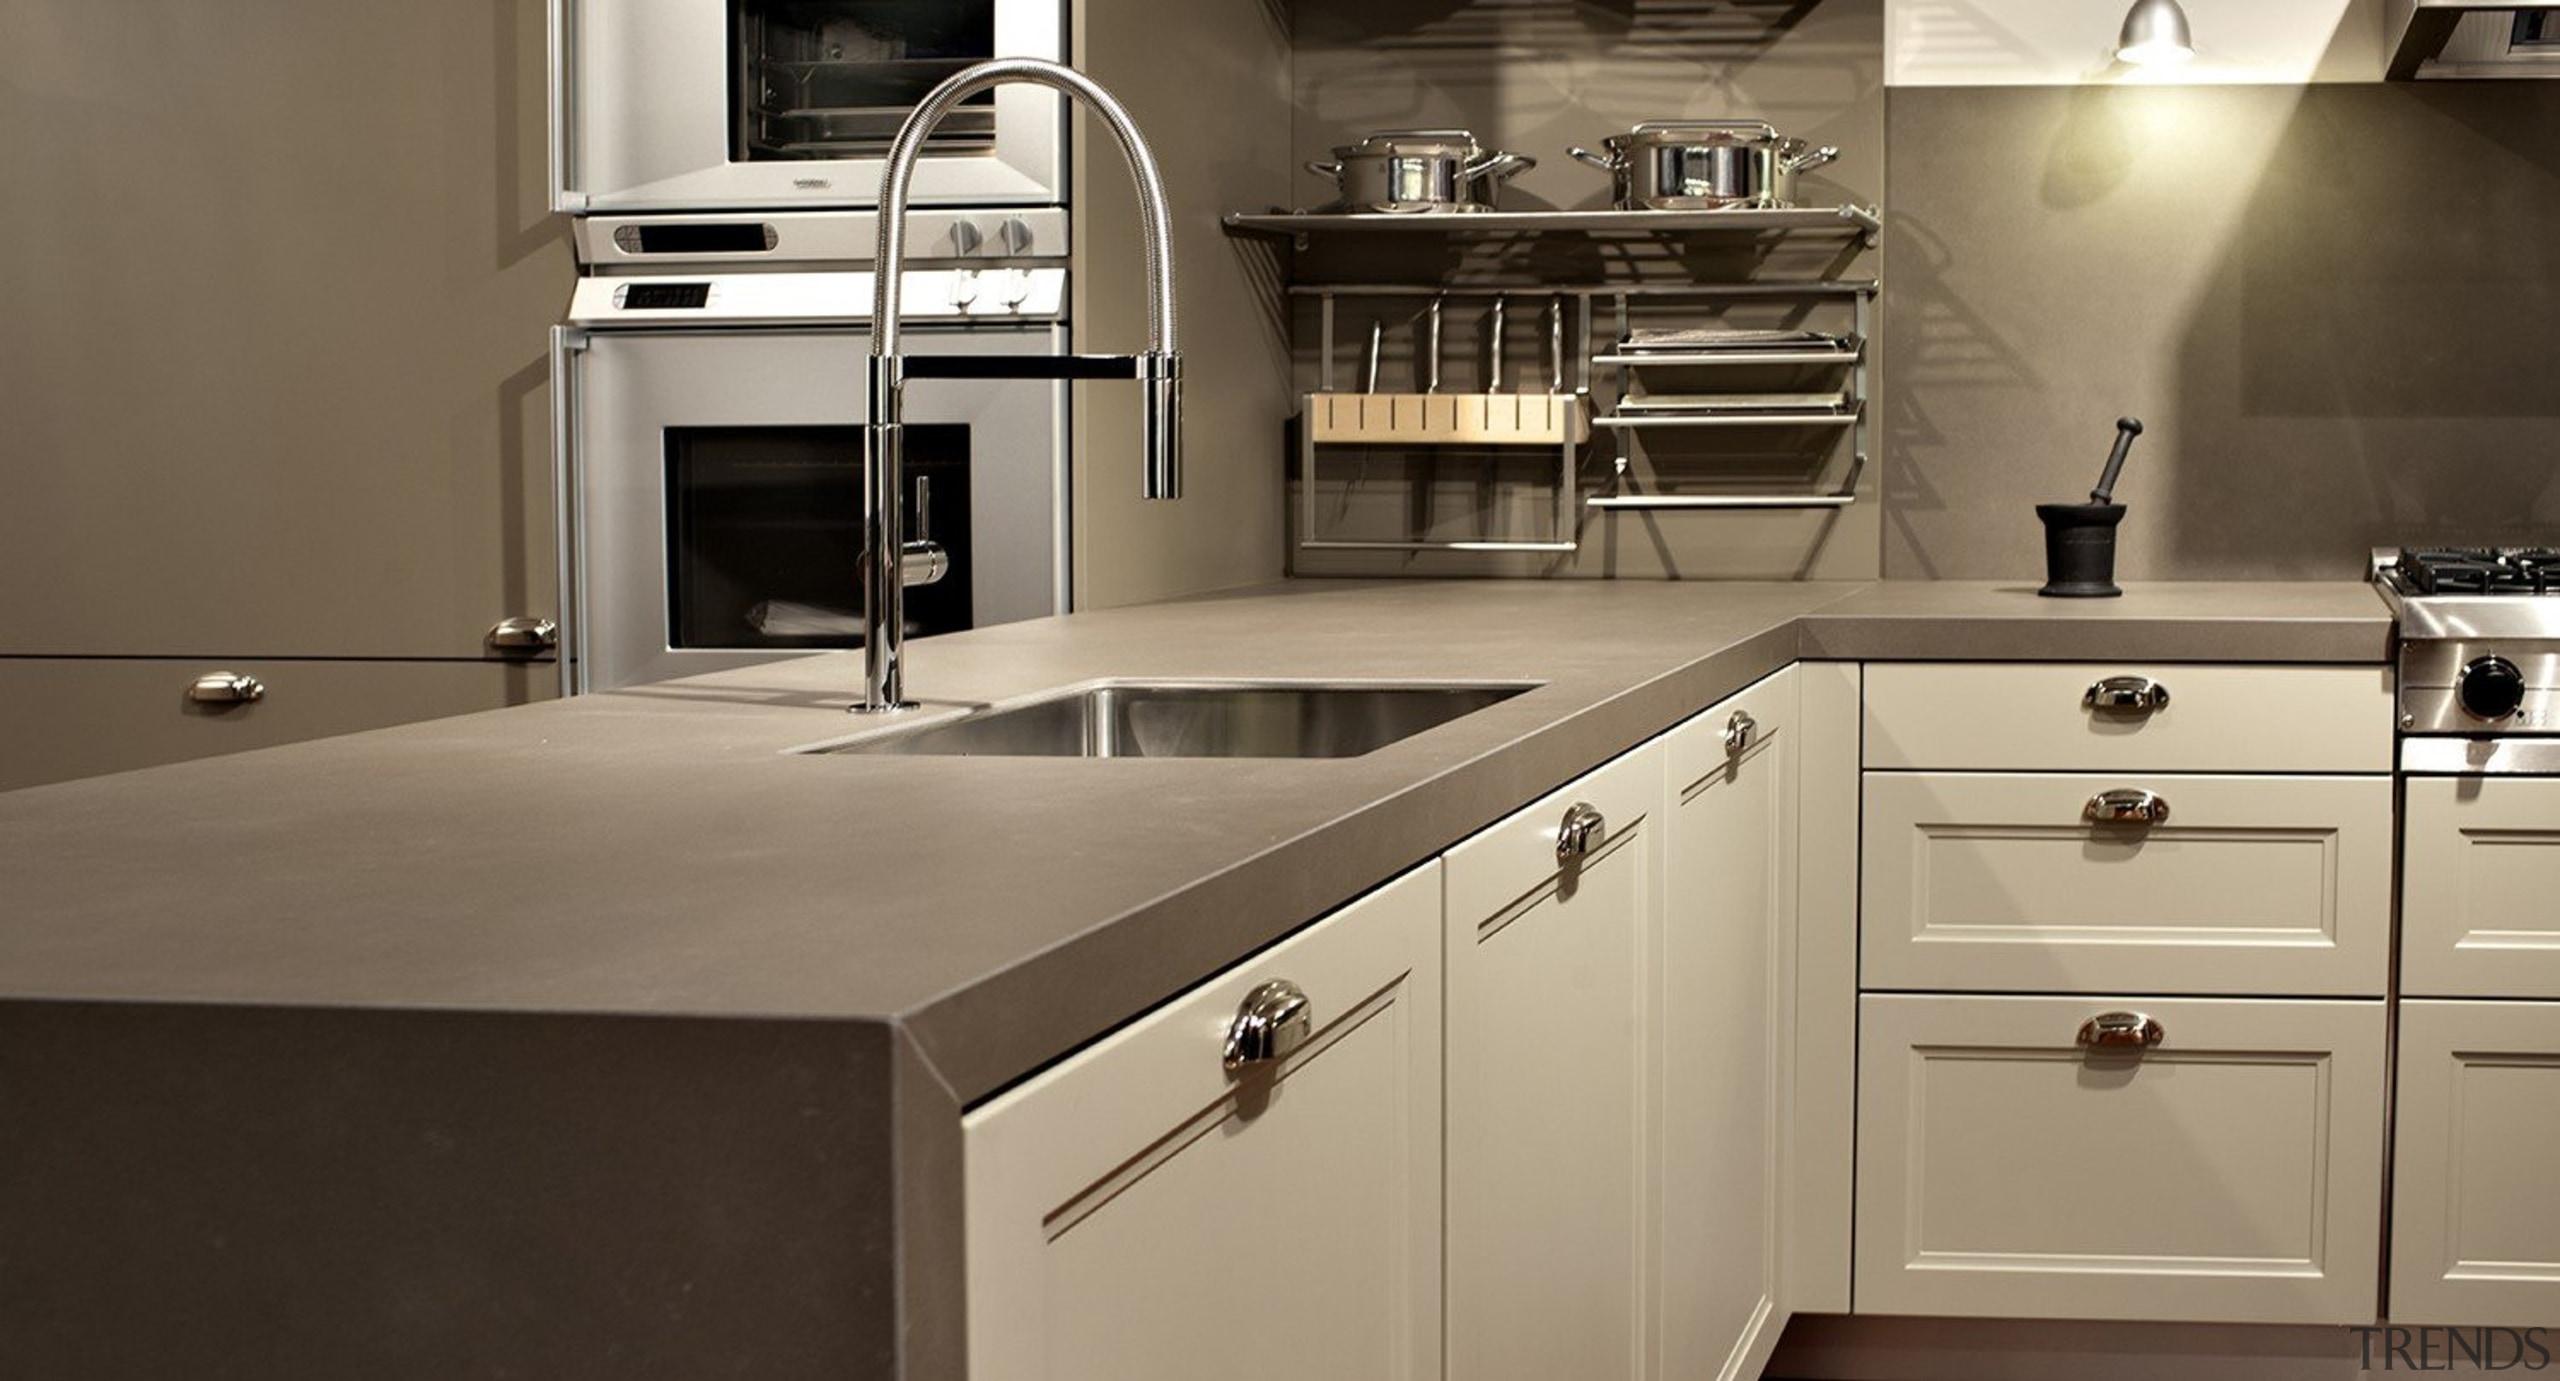 Barro Kitchen - Barro Kitchen - cabinetry | cabinetry, countertop, cuisine classique, home appliance, interior design, kitchen, kitchen appliance, kitchen stove, brown, orange